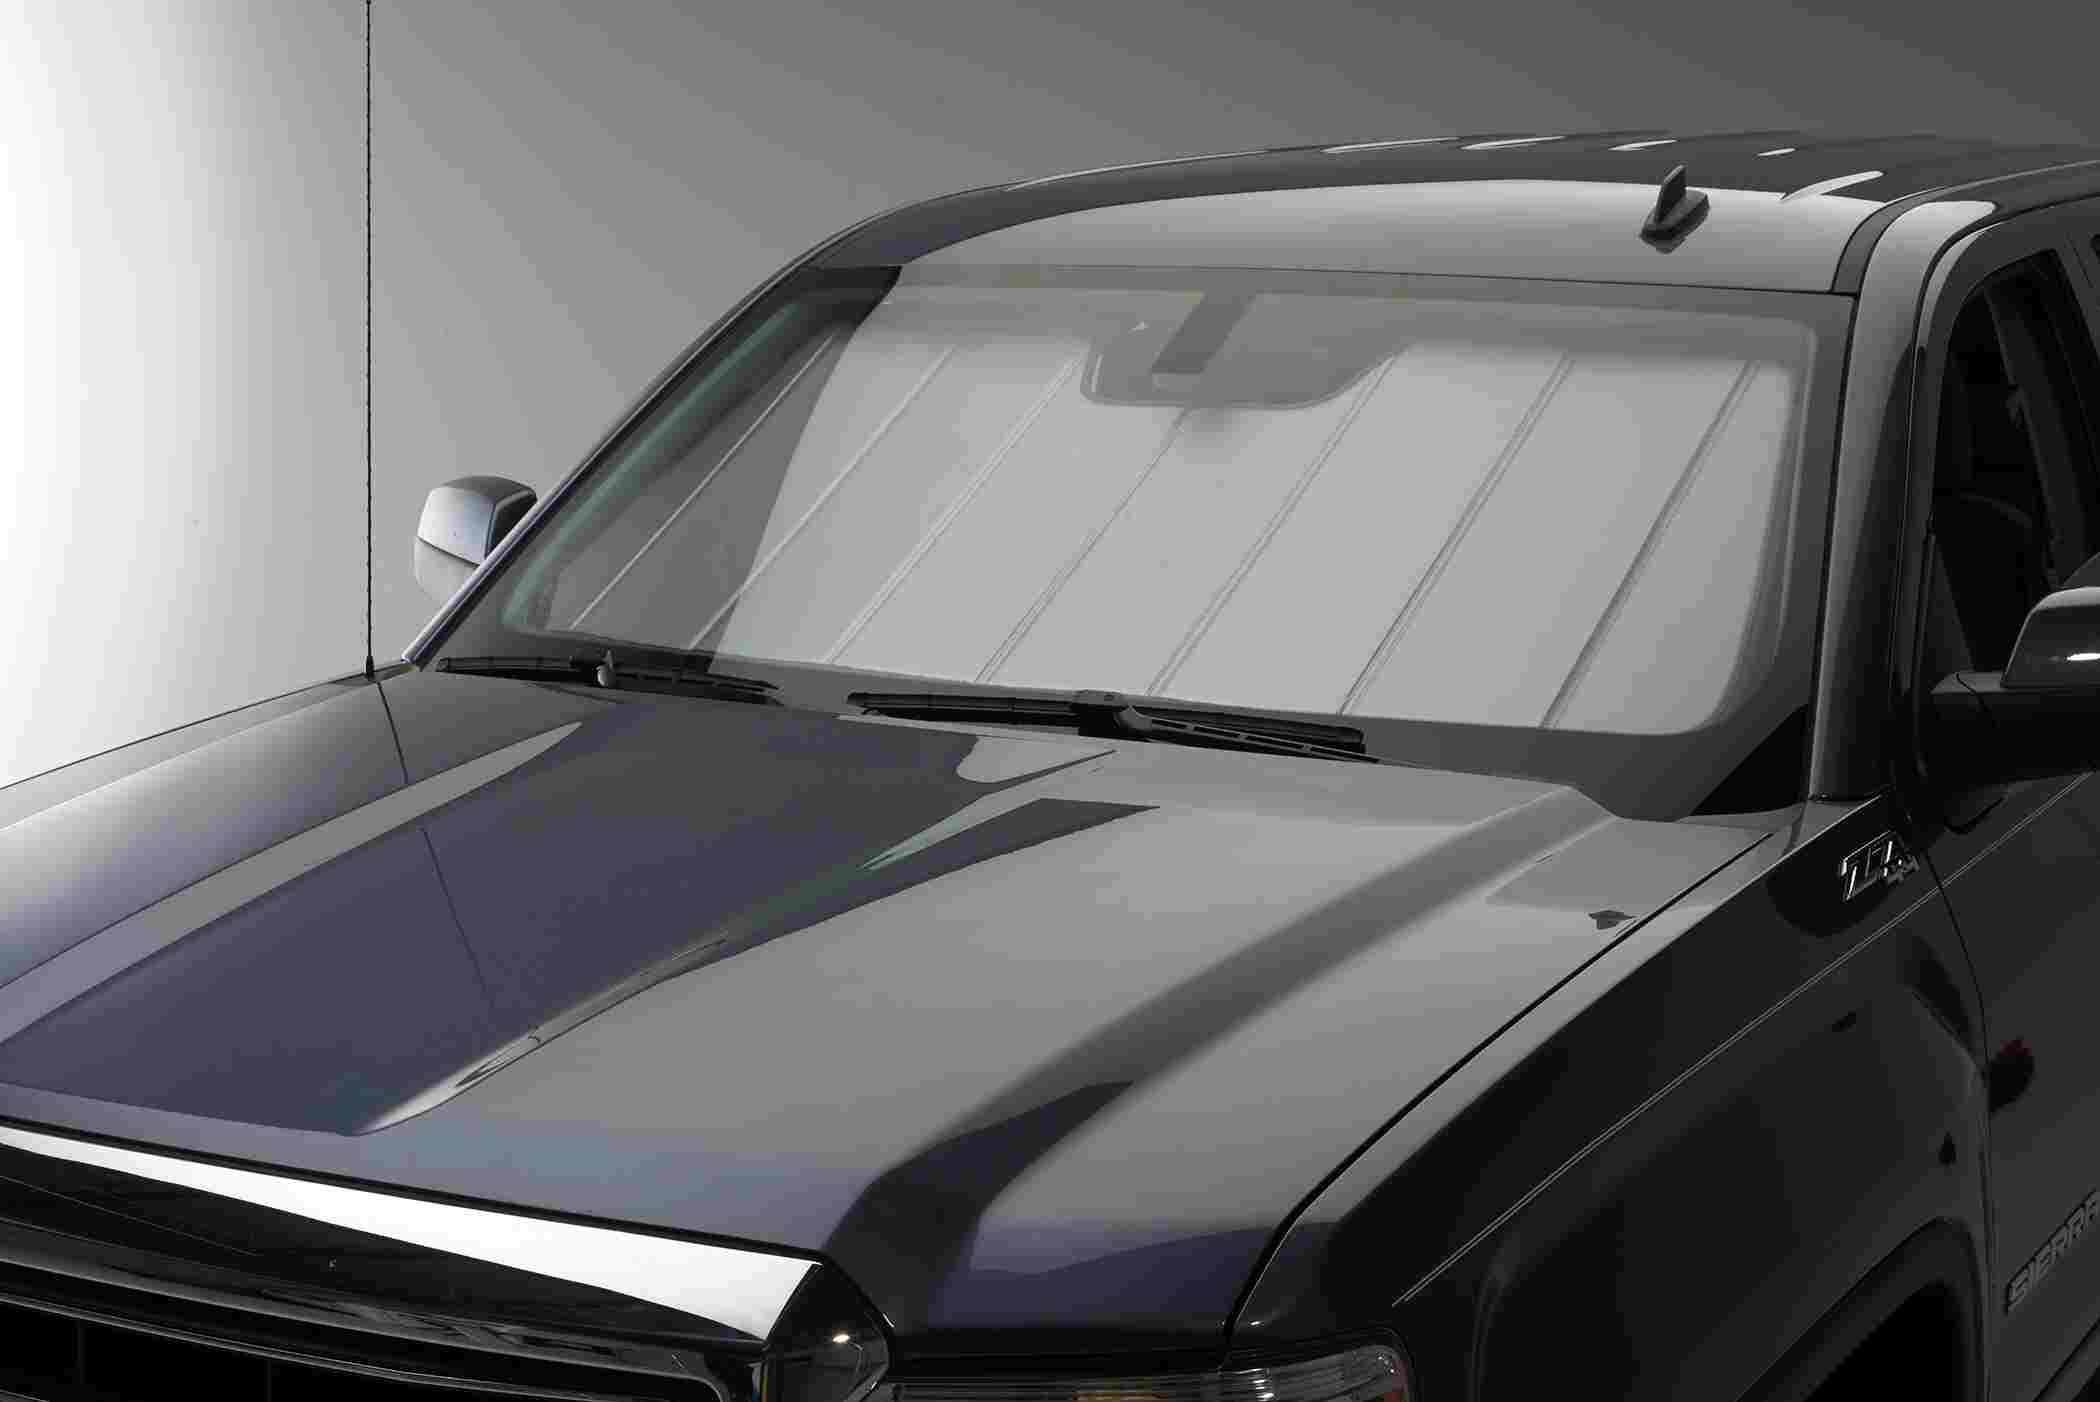 covercraft 39 s uvs100 custom sunscreens protect work trucks from uv rays. Black Bedroom Furniture Sets. Home Design Ideas